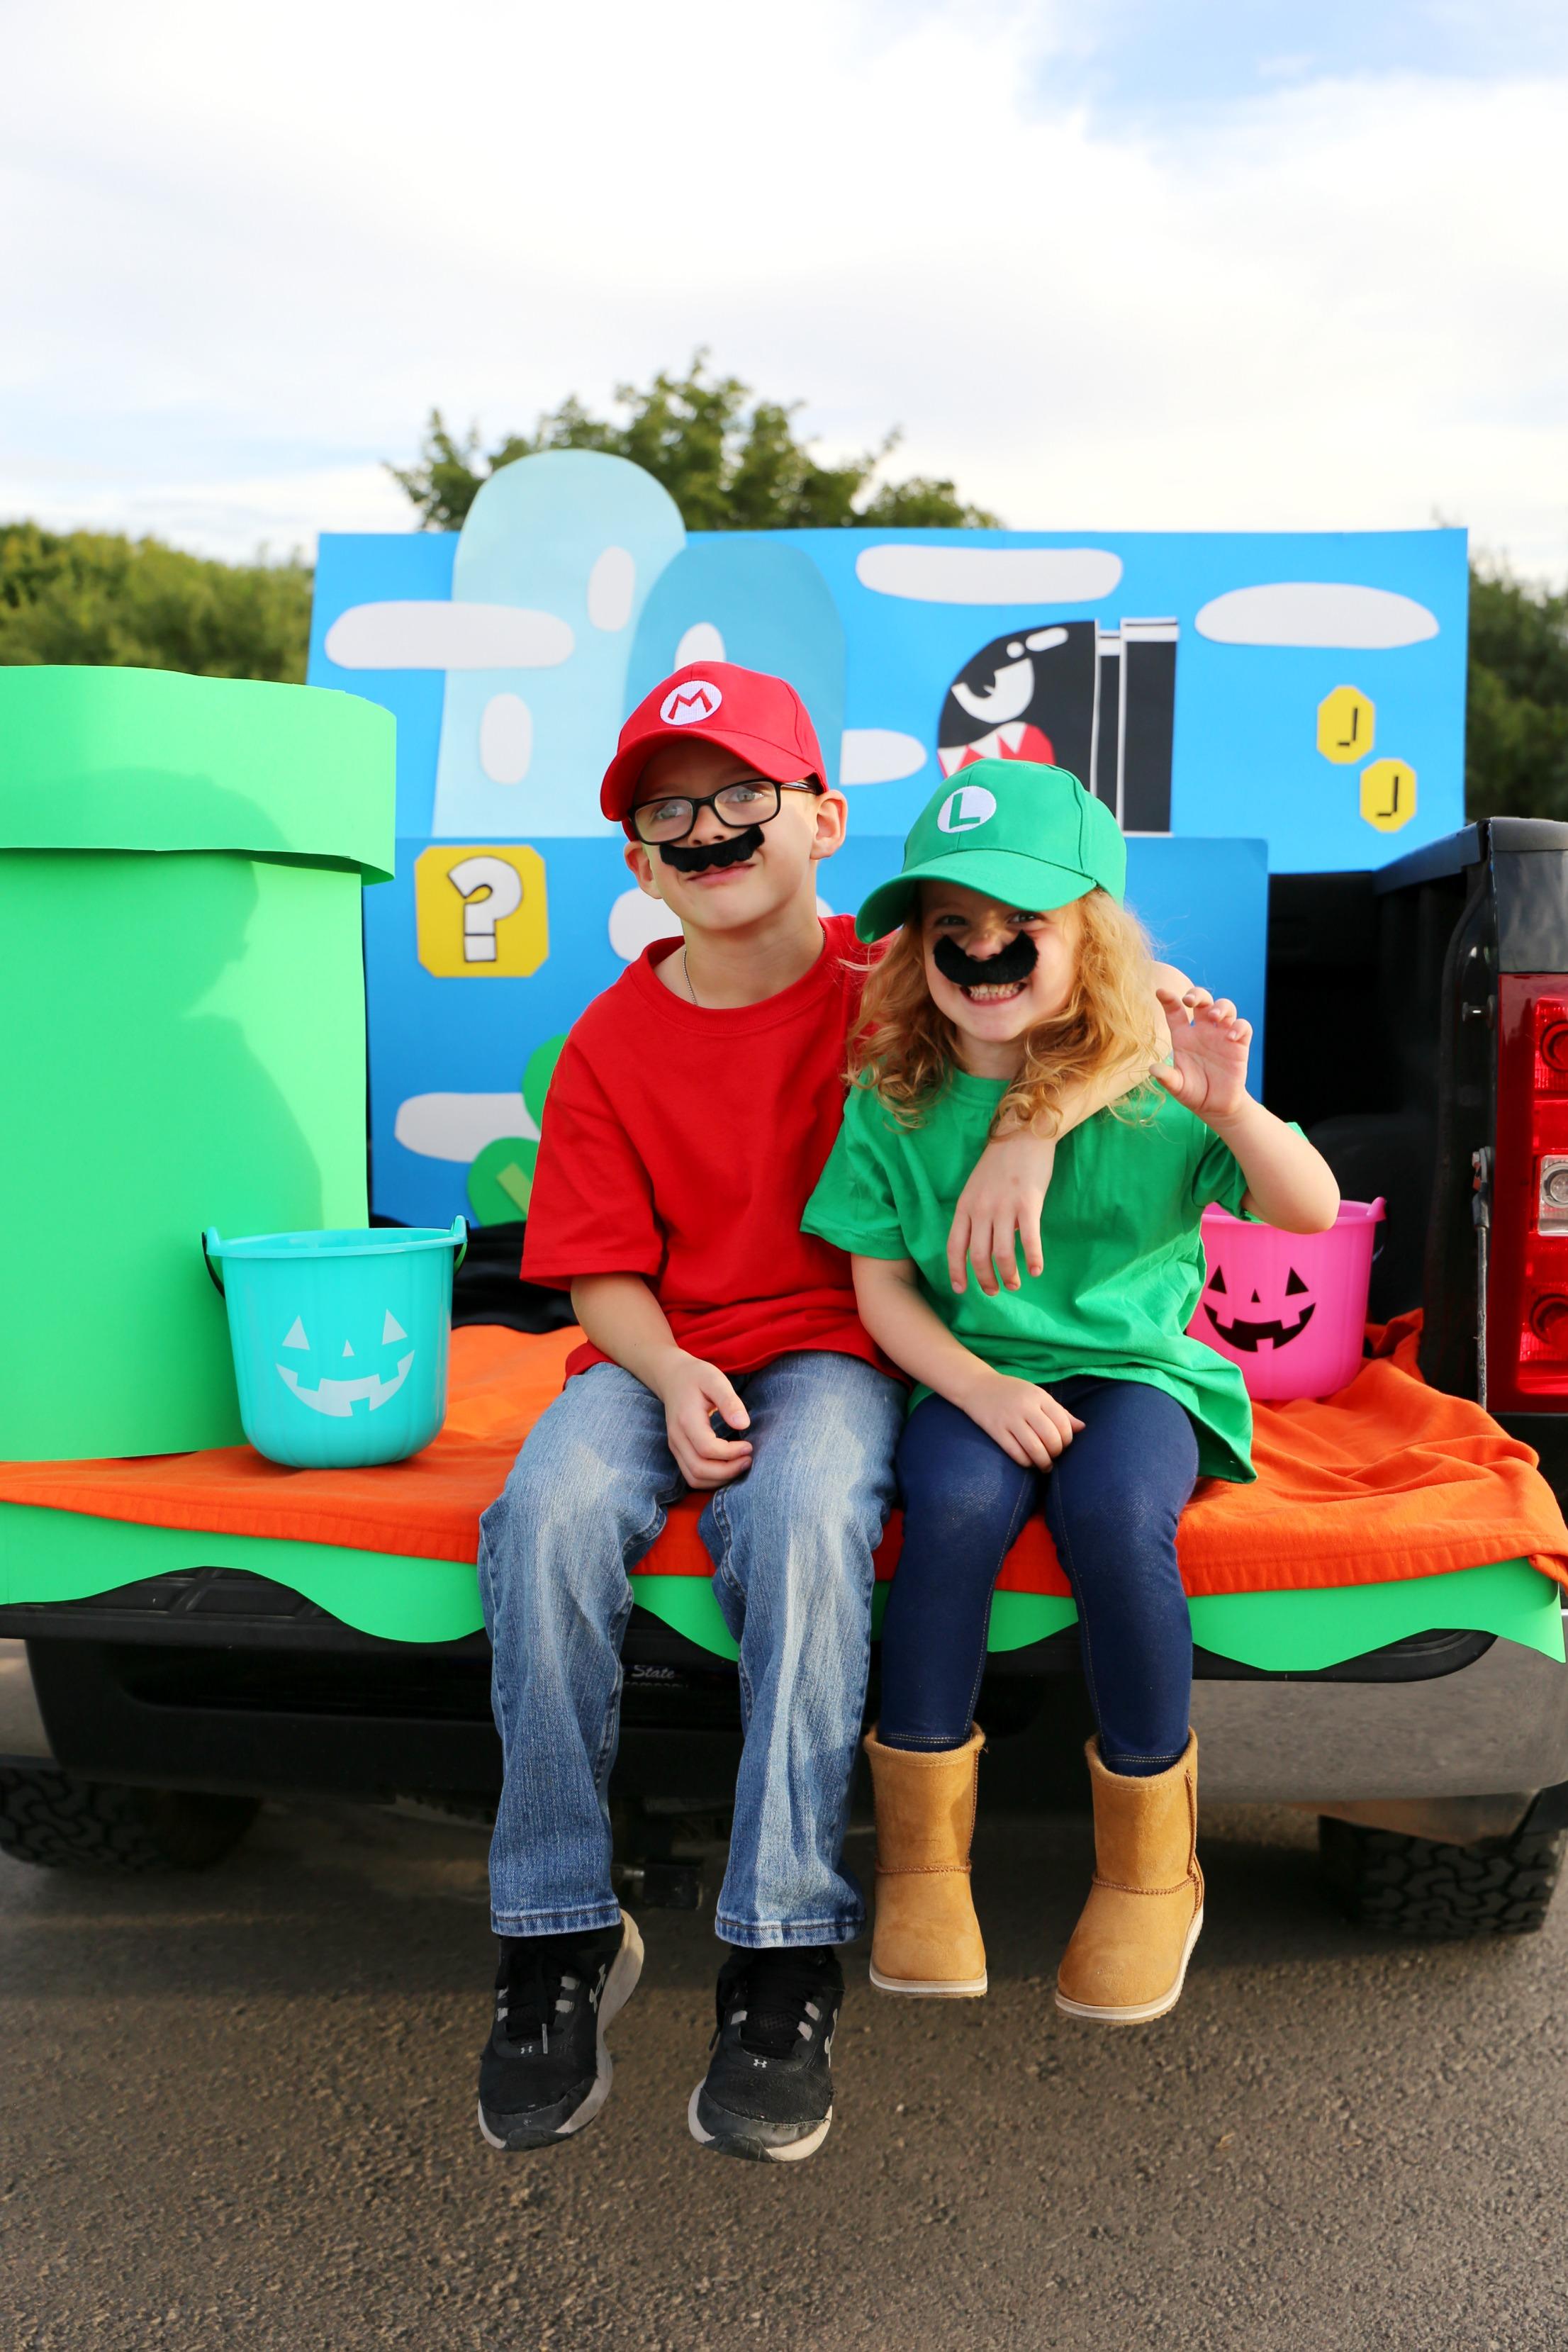 Super Mario Trunk or Treat Halloween Ideas plus Easy Mario, Luigi, and Princess Peach Costume Ideas